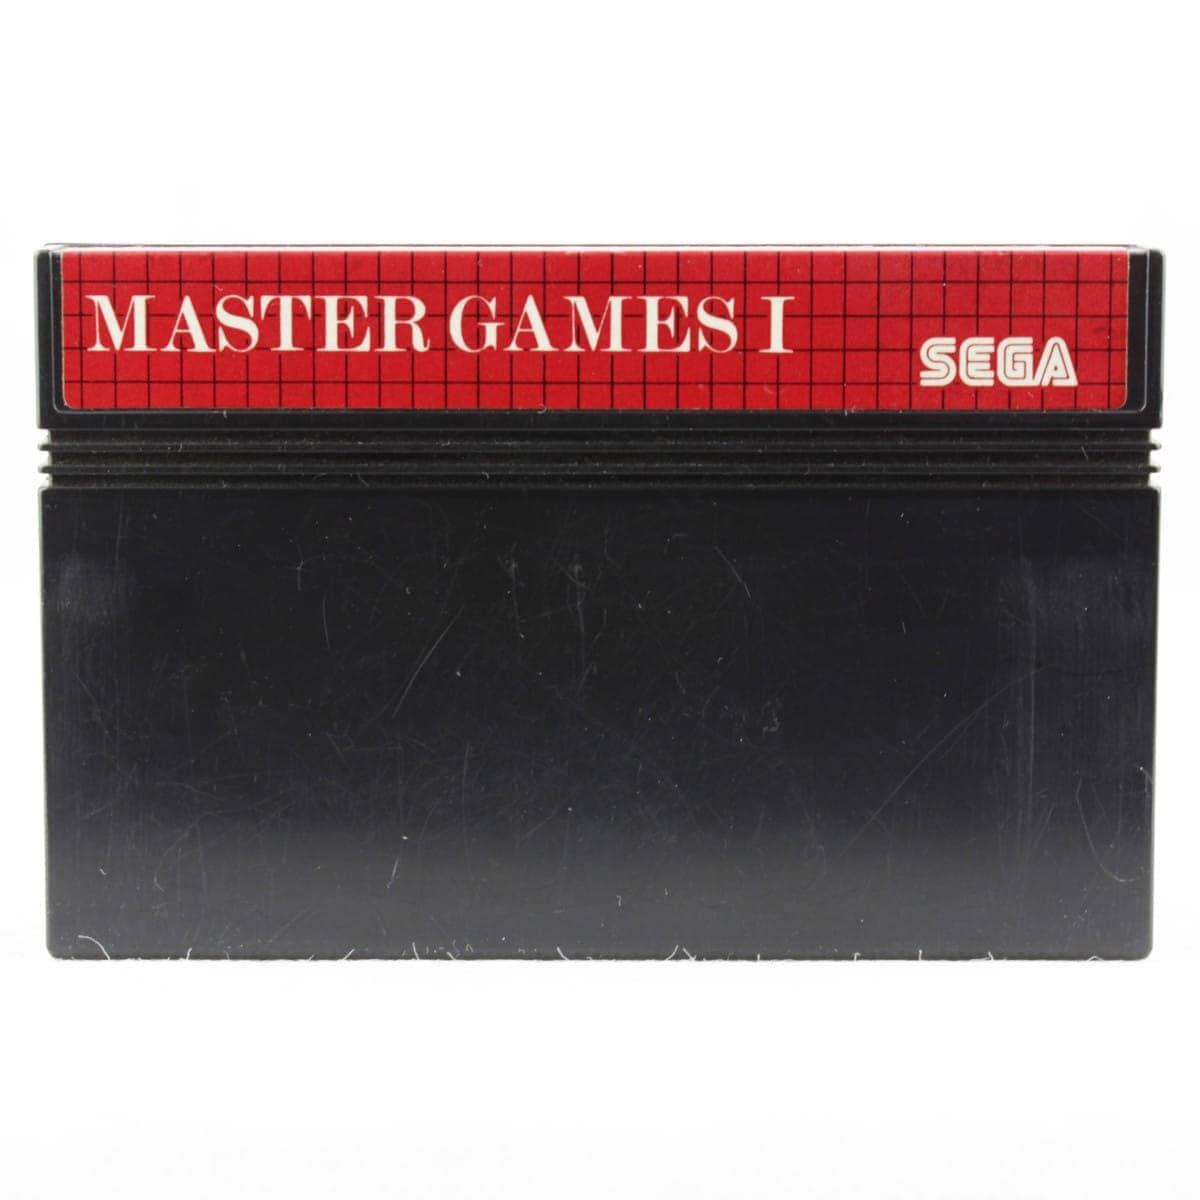 Master Games I (SEGA Master System - Løs spil)